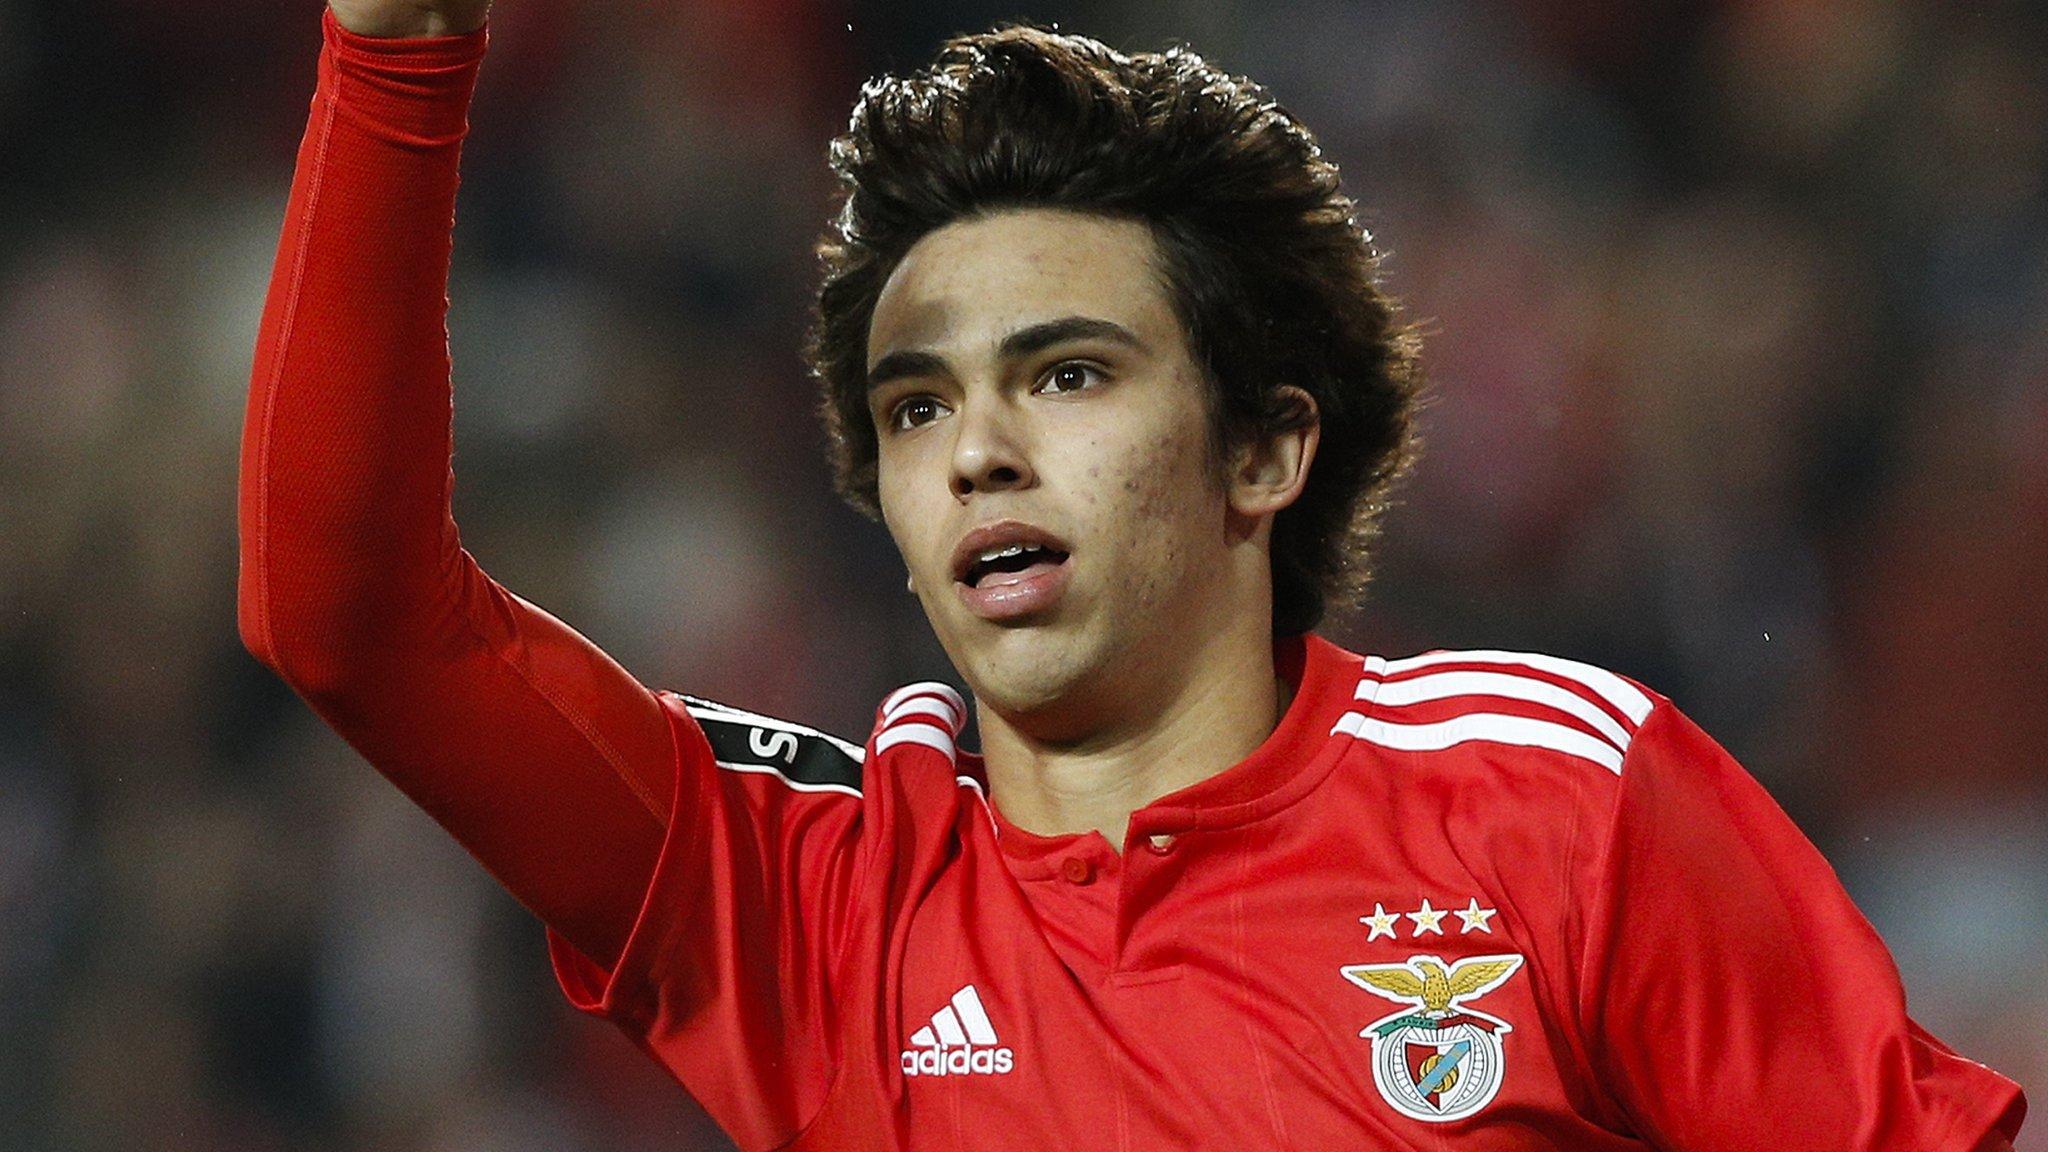 Football gossip: Felix, Zaha, Sane, Trippier, Gattuso, Mahrez, Hudson-Odoi, Coutinho, Richarlison